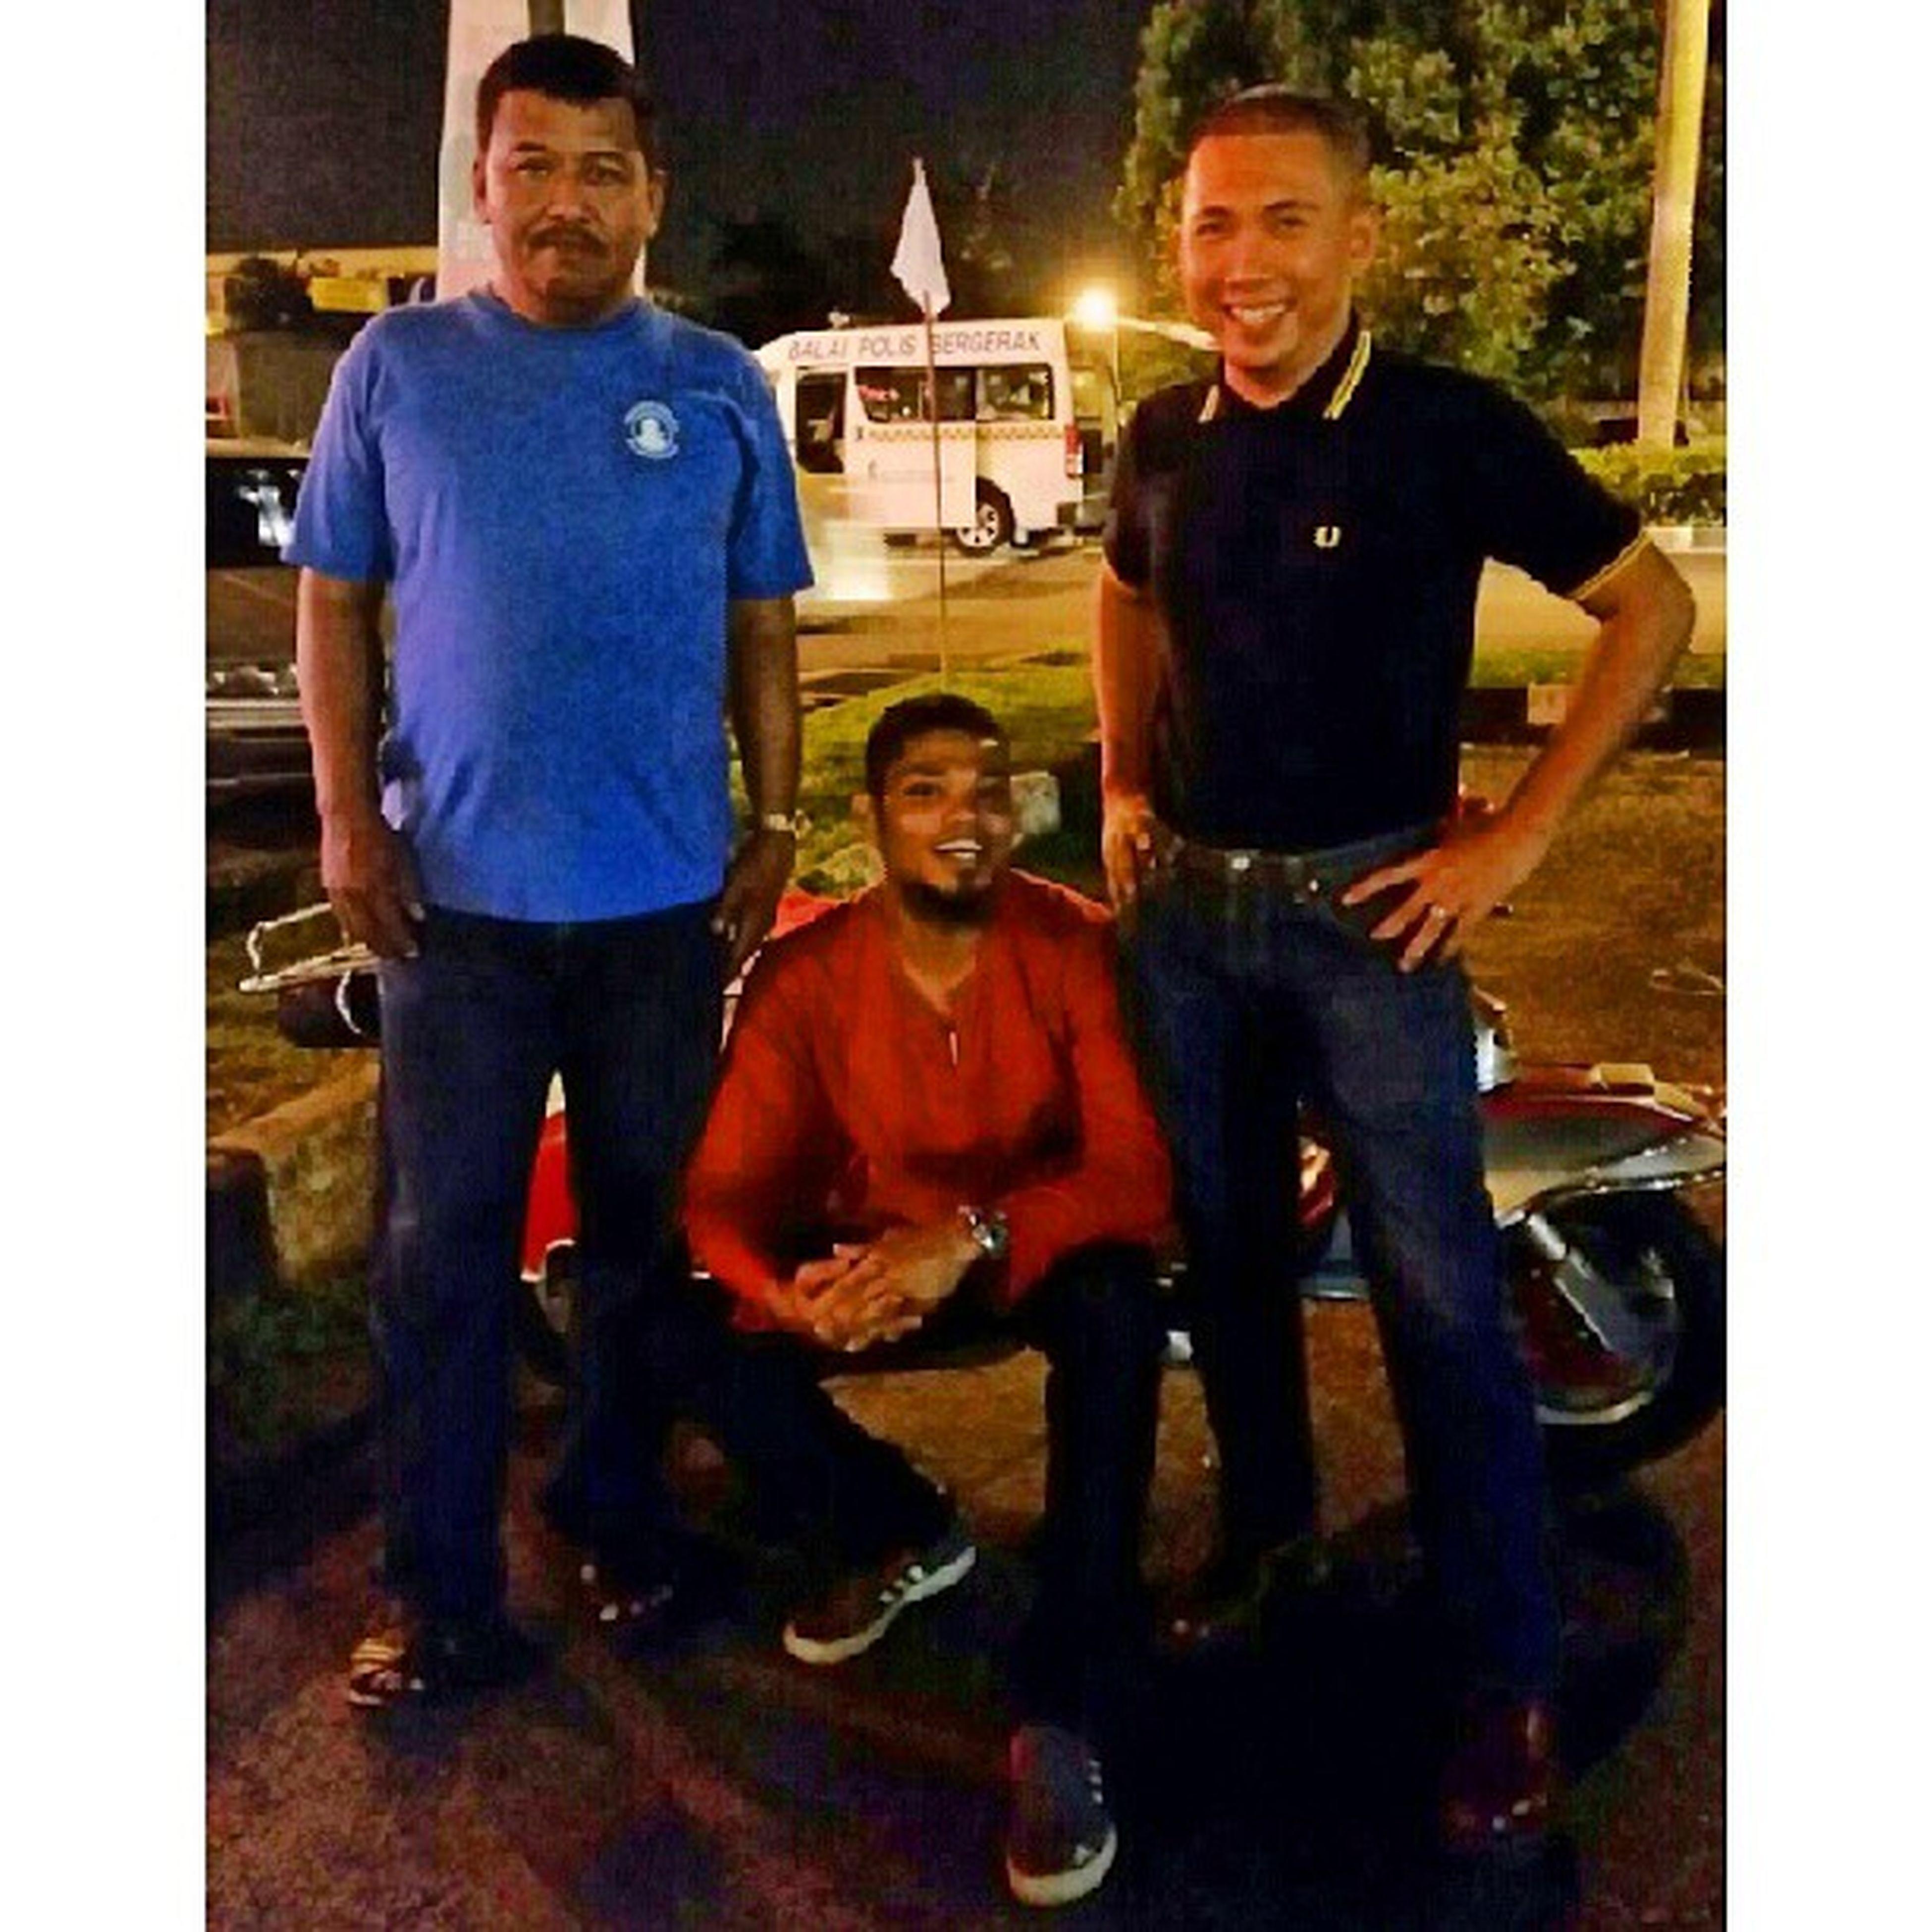 Skinhead Lambretta Sigiler Kluang malaysianskinhead drmartens boots fredperry